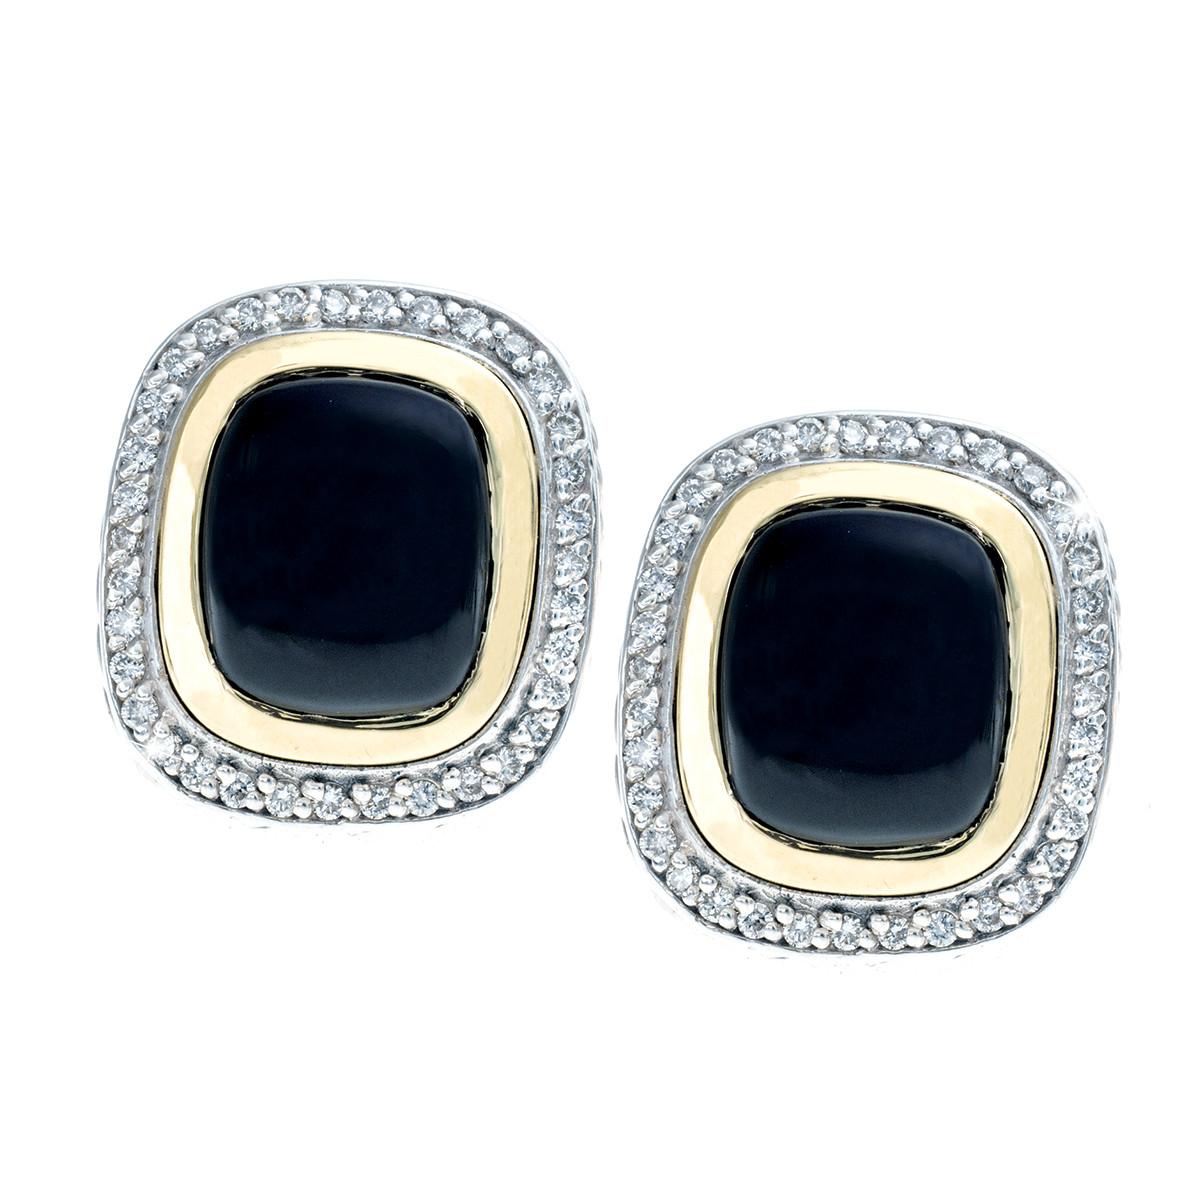 Vintage David Yurman Onyx & Diamond Albion Earrings